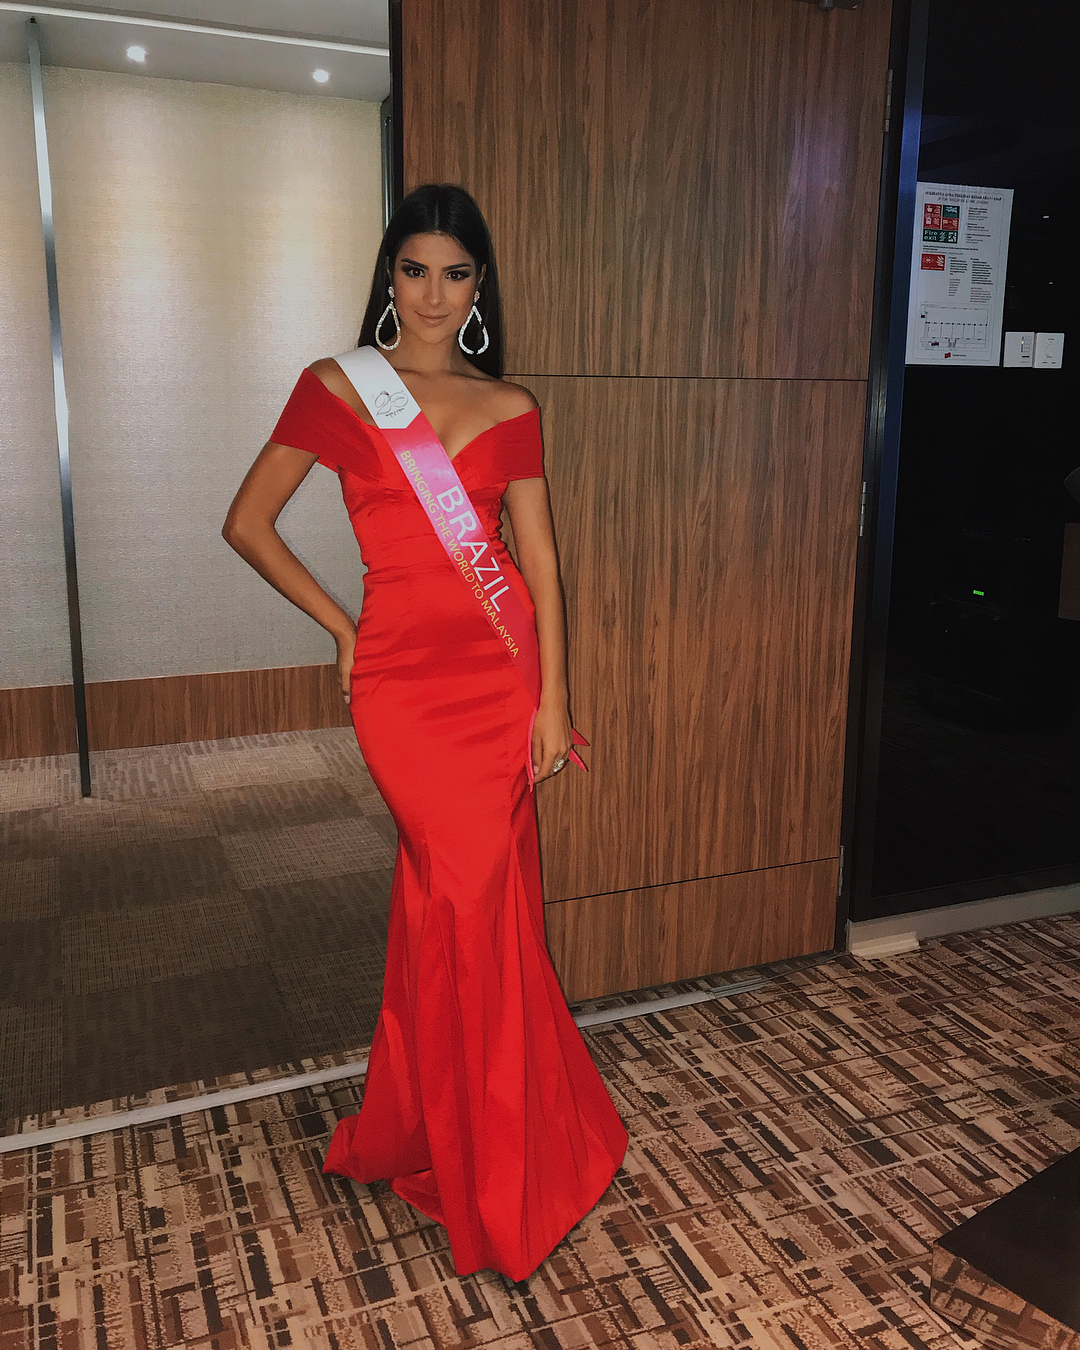 julia horta, miss brasil universo 2019/top 2 de reynado internacional cafe 2016, top 5 de miss tourism international 2017. - Página 6 23735069_1693842624012499_1739885943030022144_n